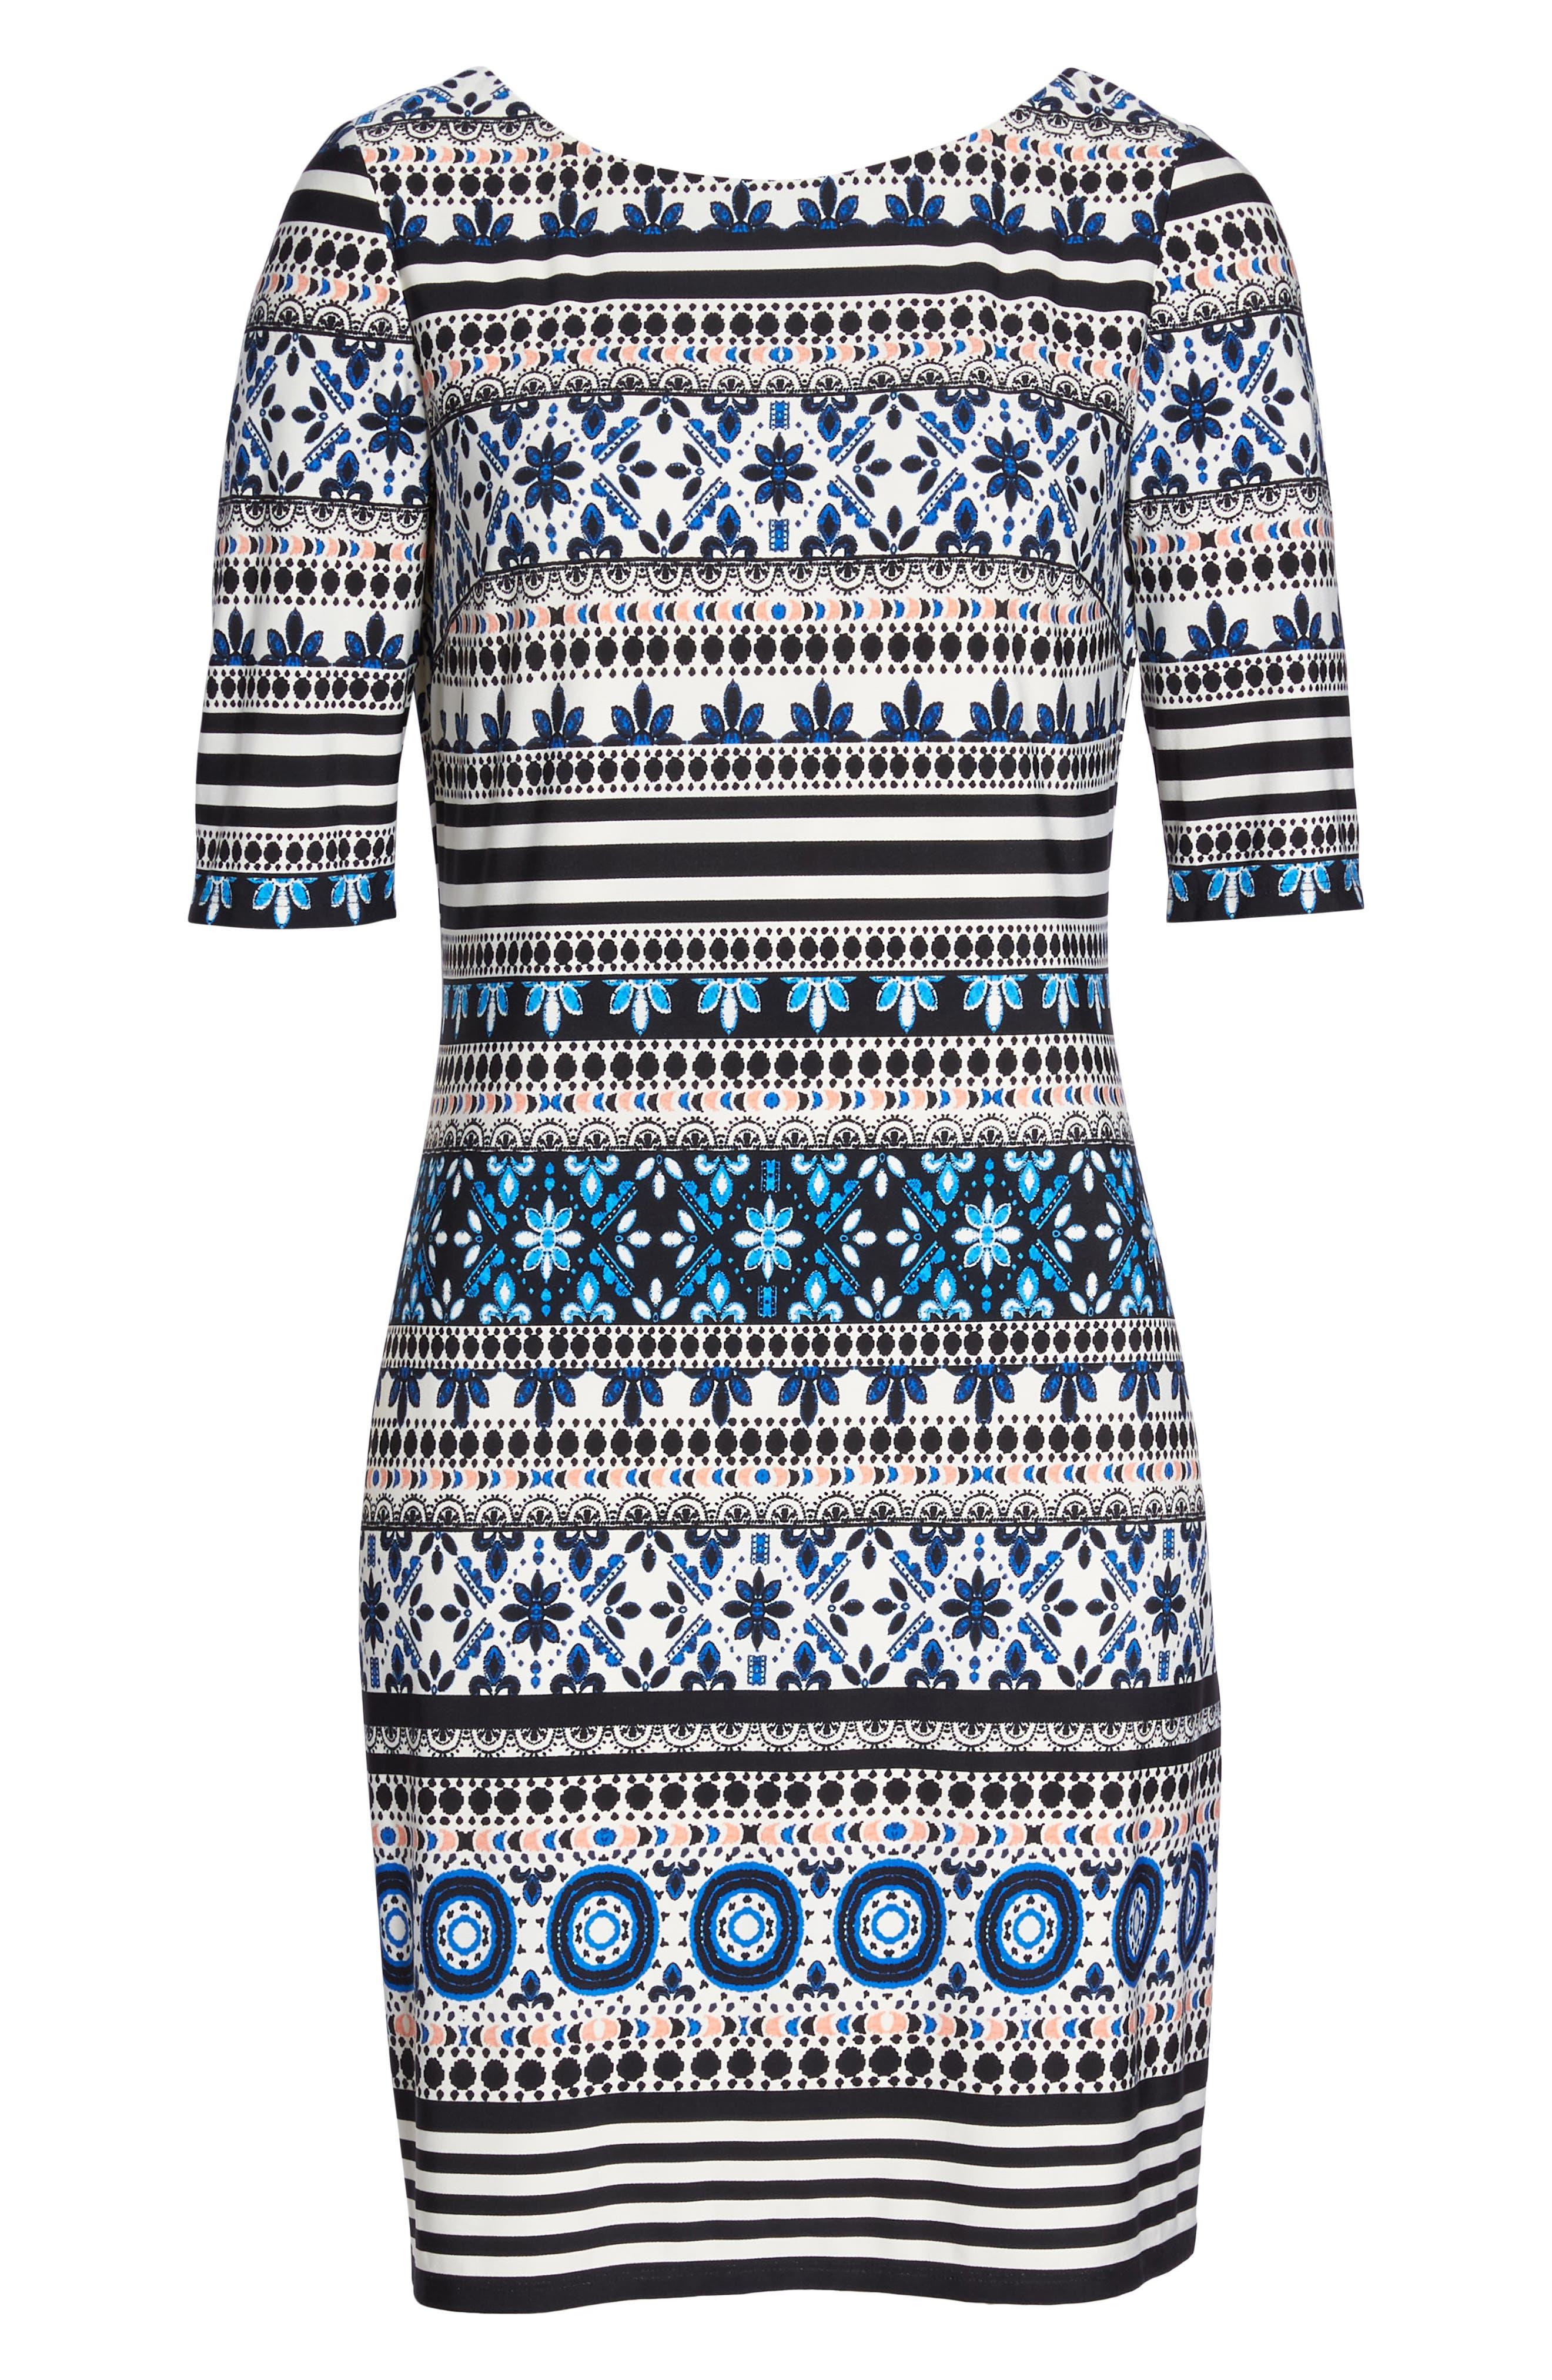 Medallion Stripe Shift Dress,                             Alternate thumbnail 7, color,                             Black/ Blue/ Ivory